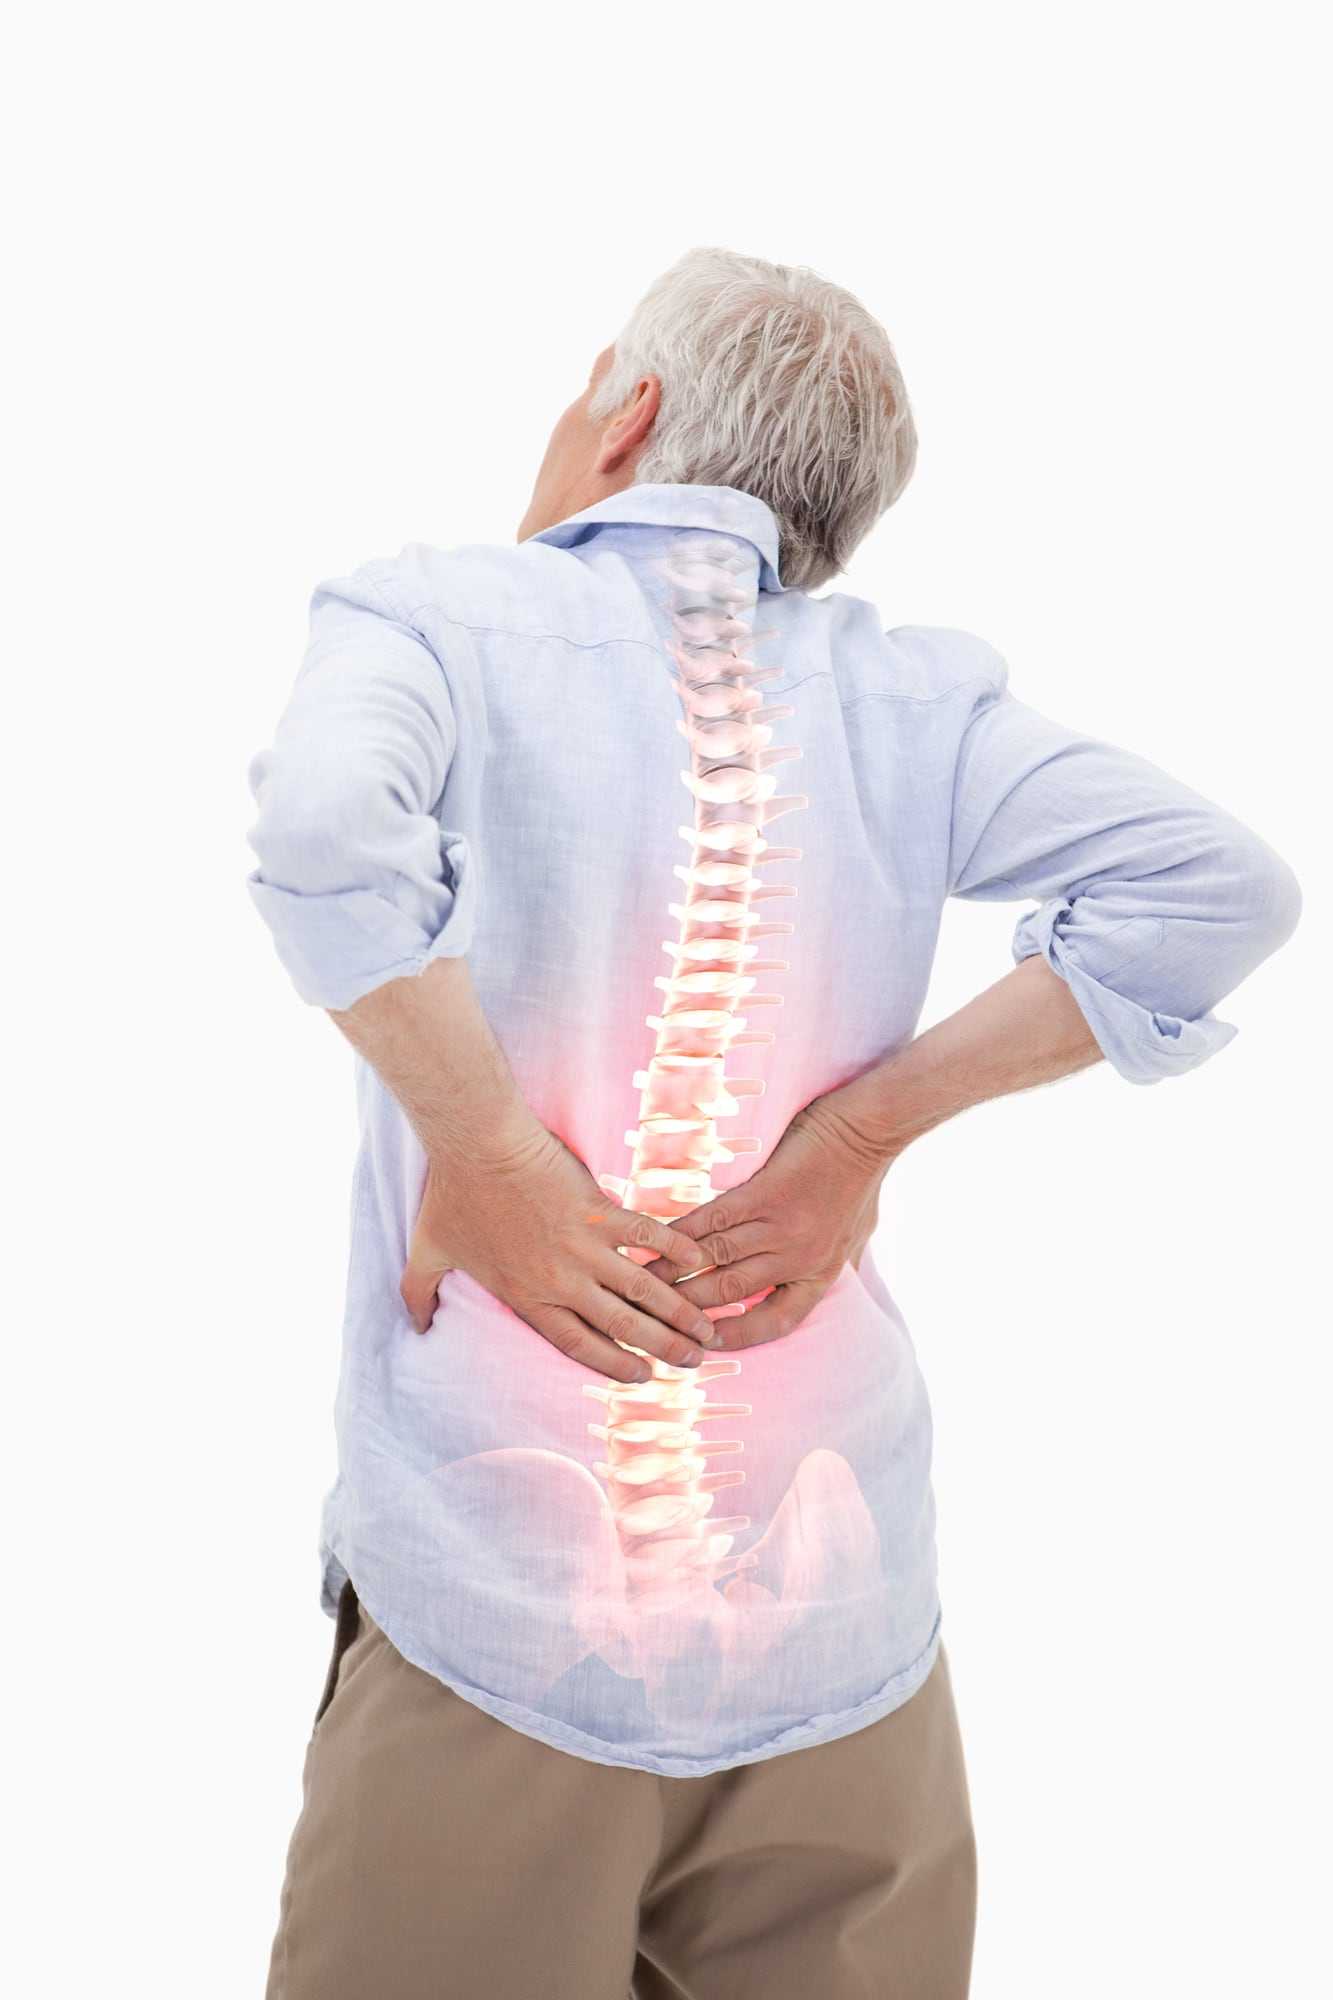 elderly man with chronic back pain